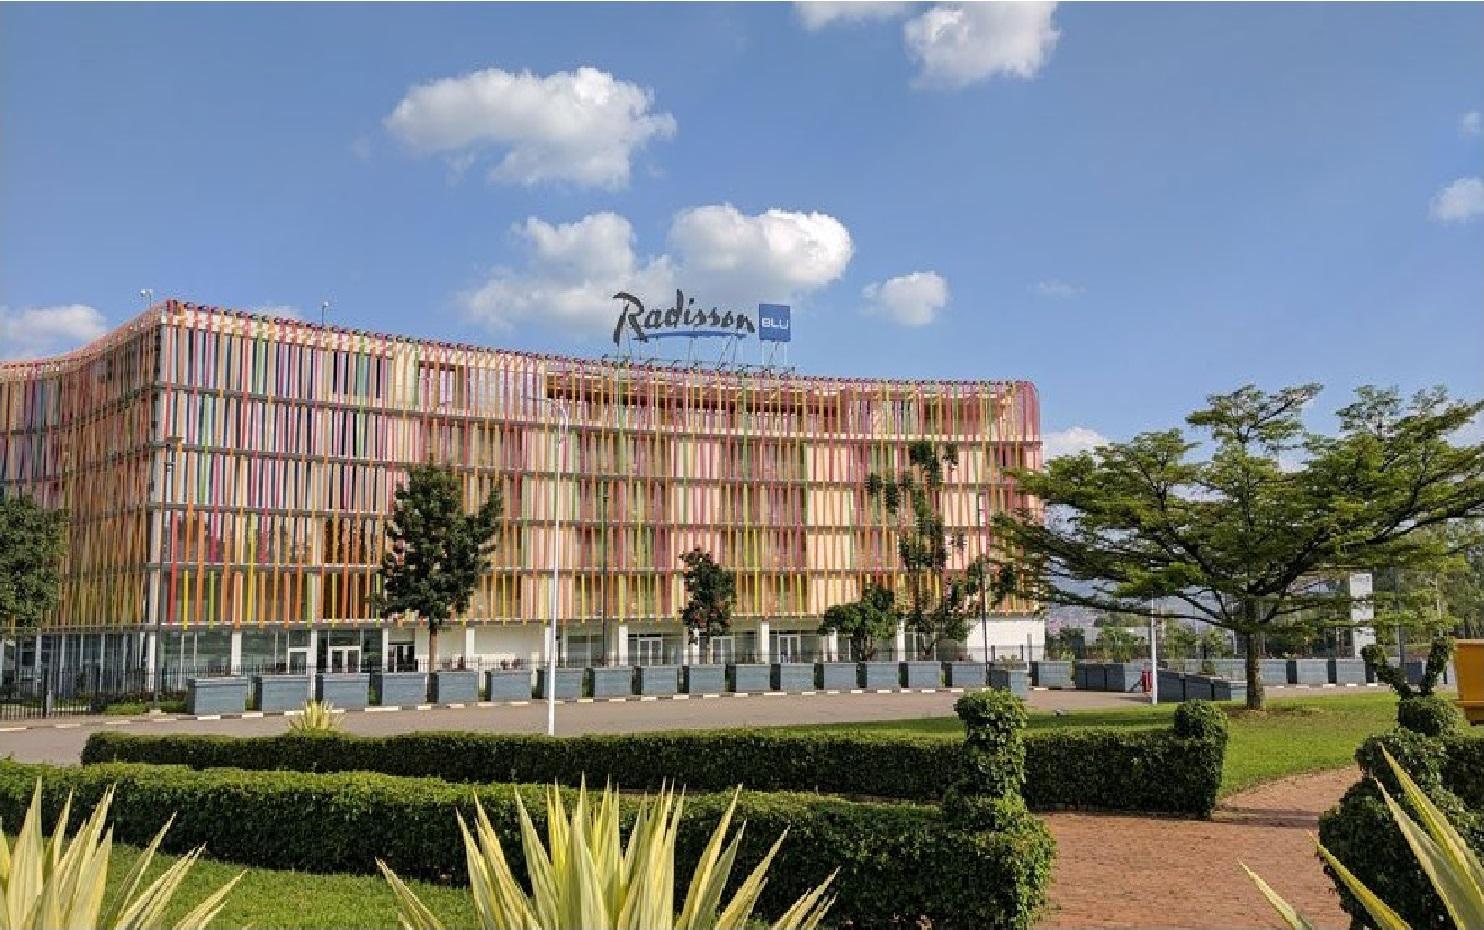 Radisson Blu Kigali